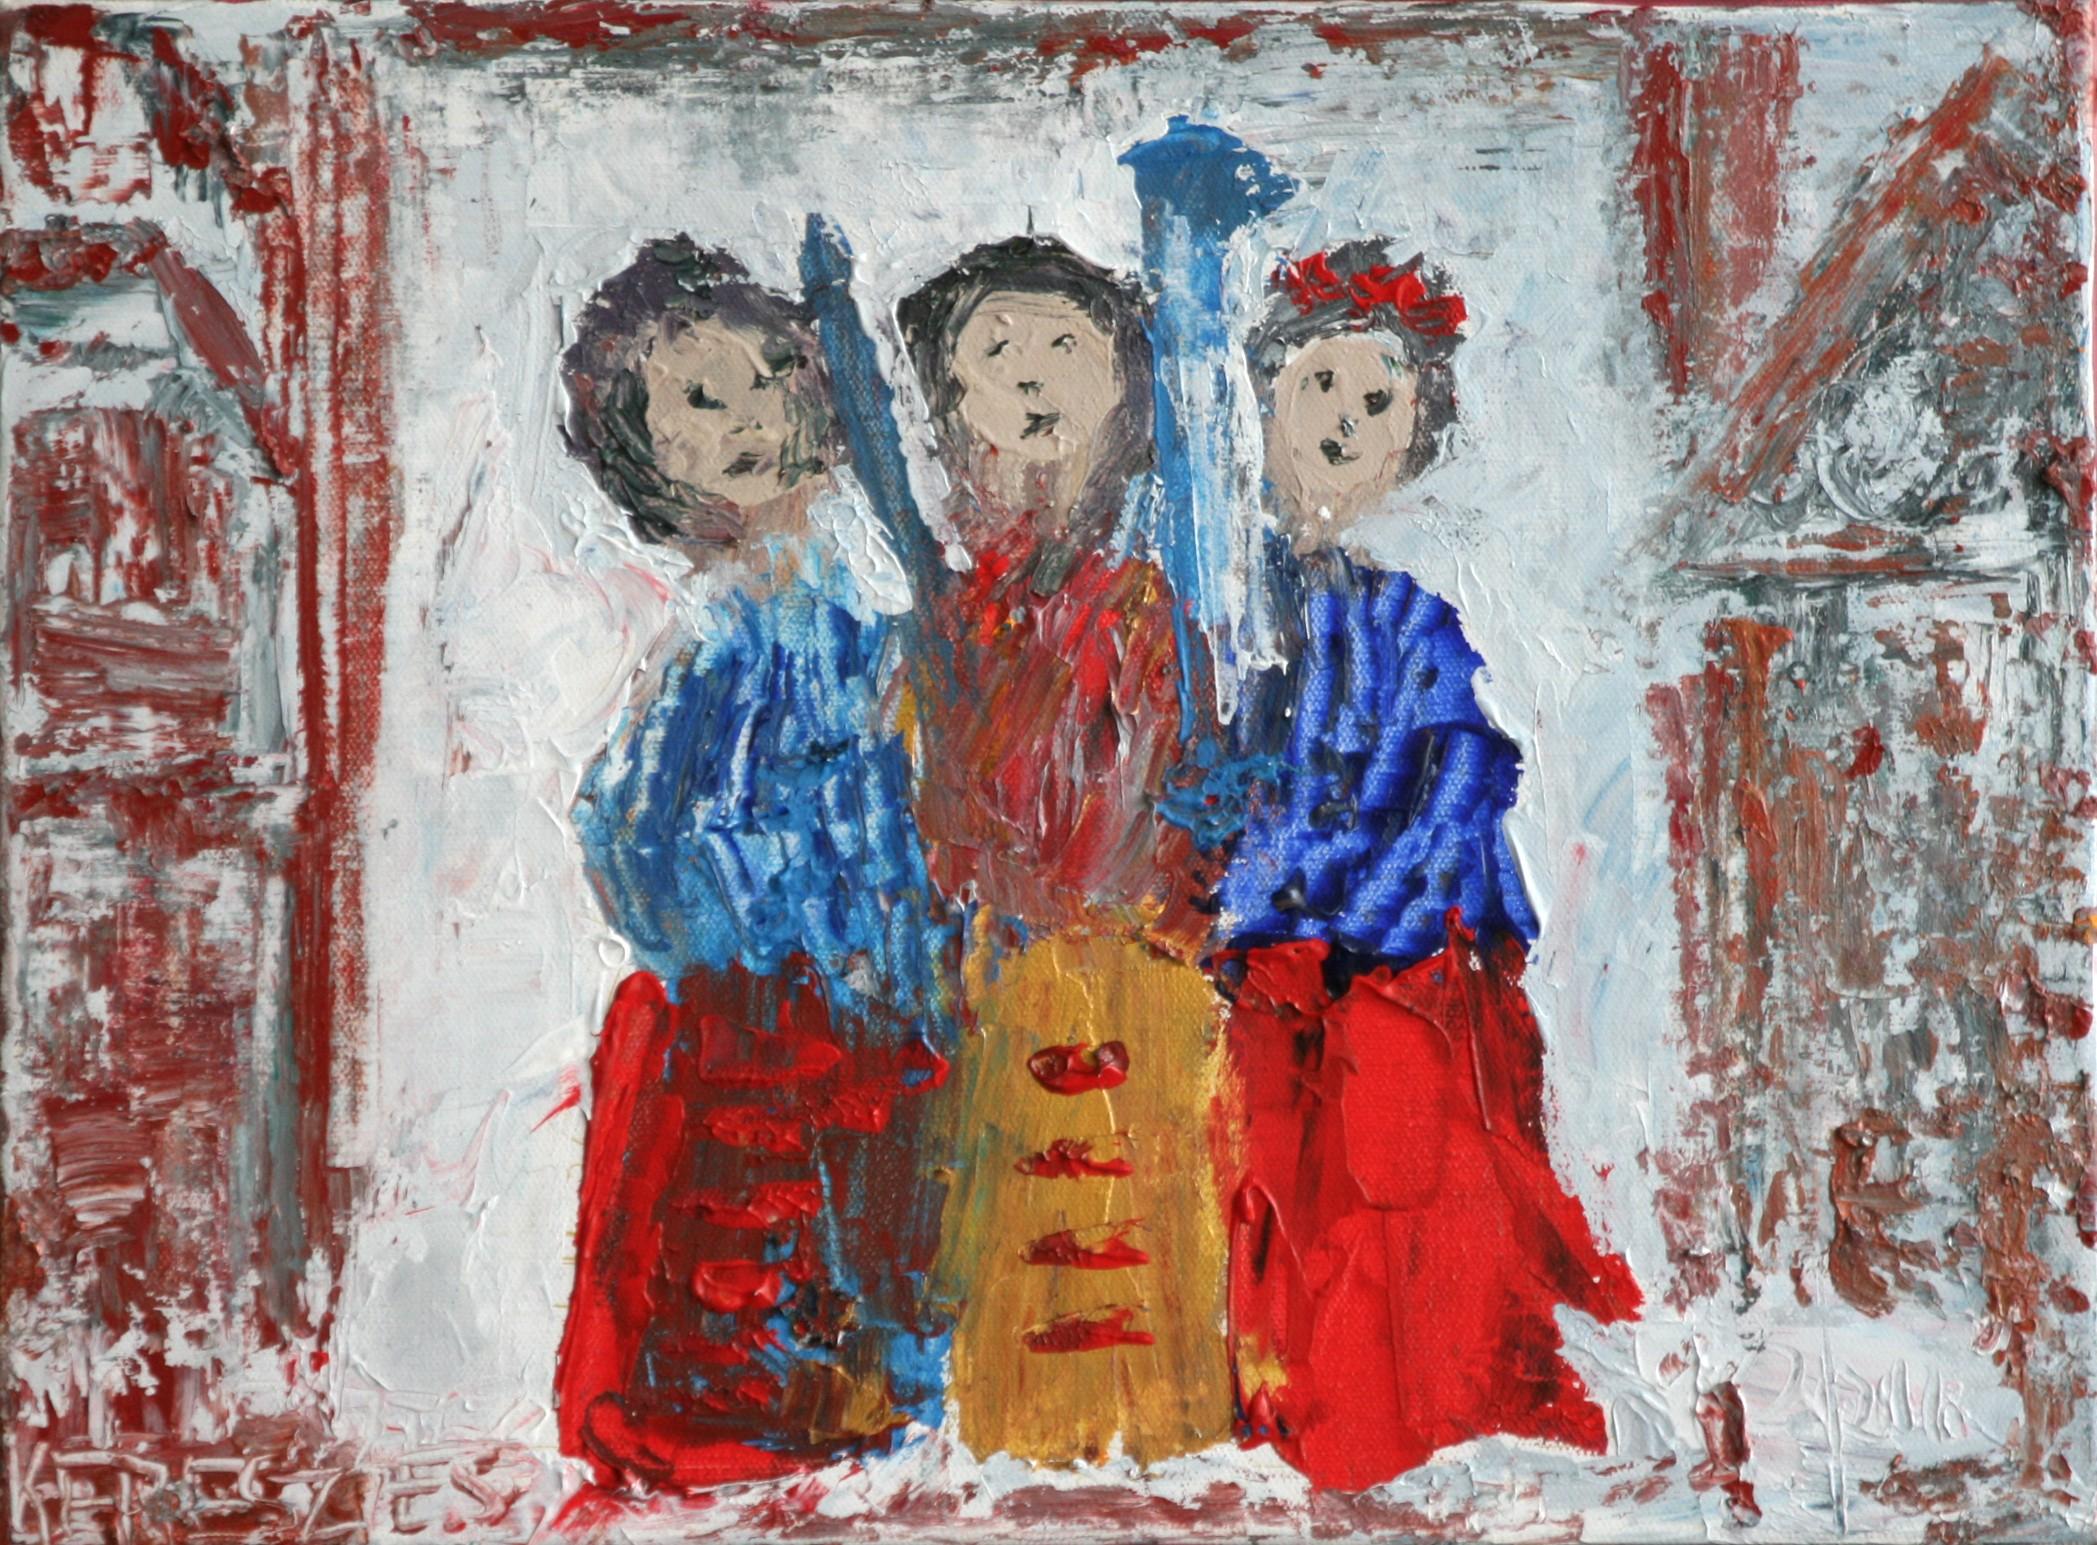 toile 4 - magdalena keresztes, artiste peintre à amiens